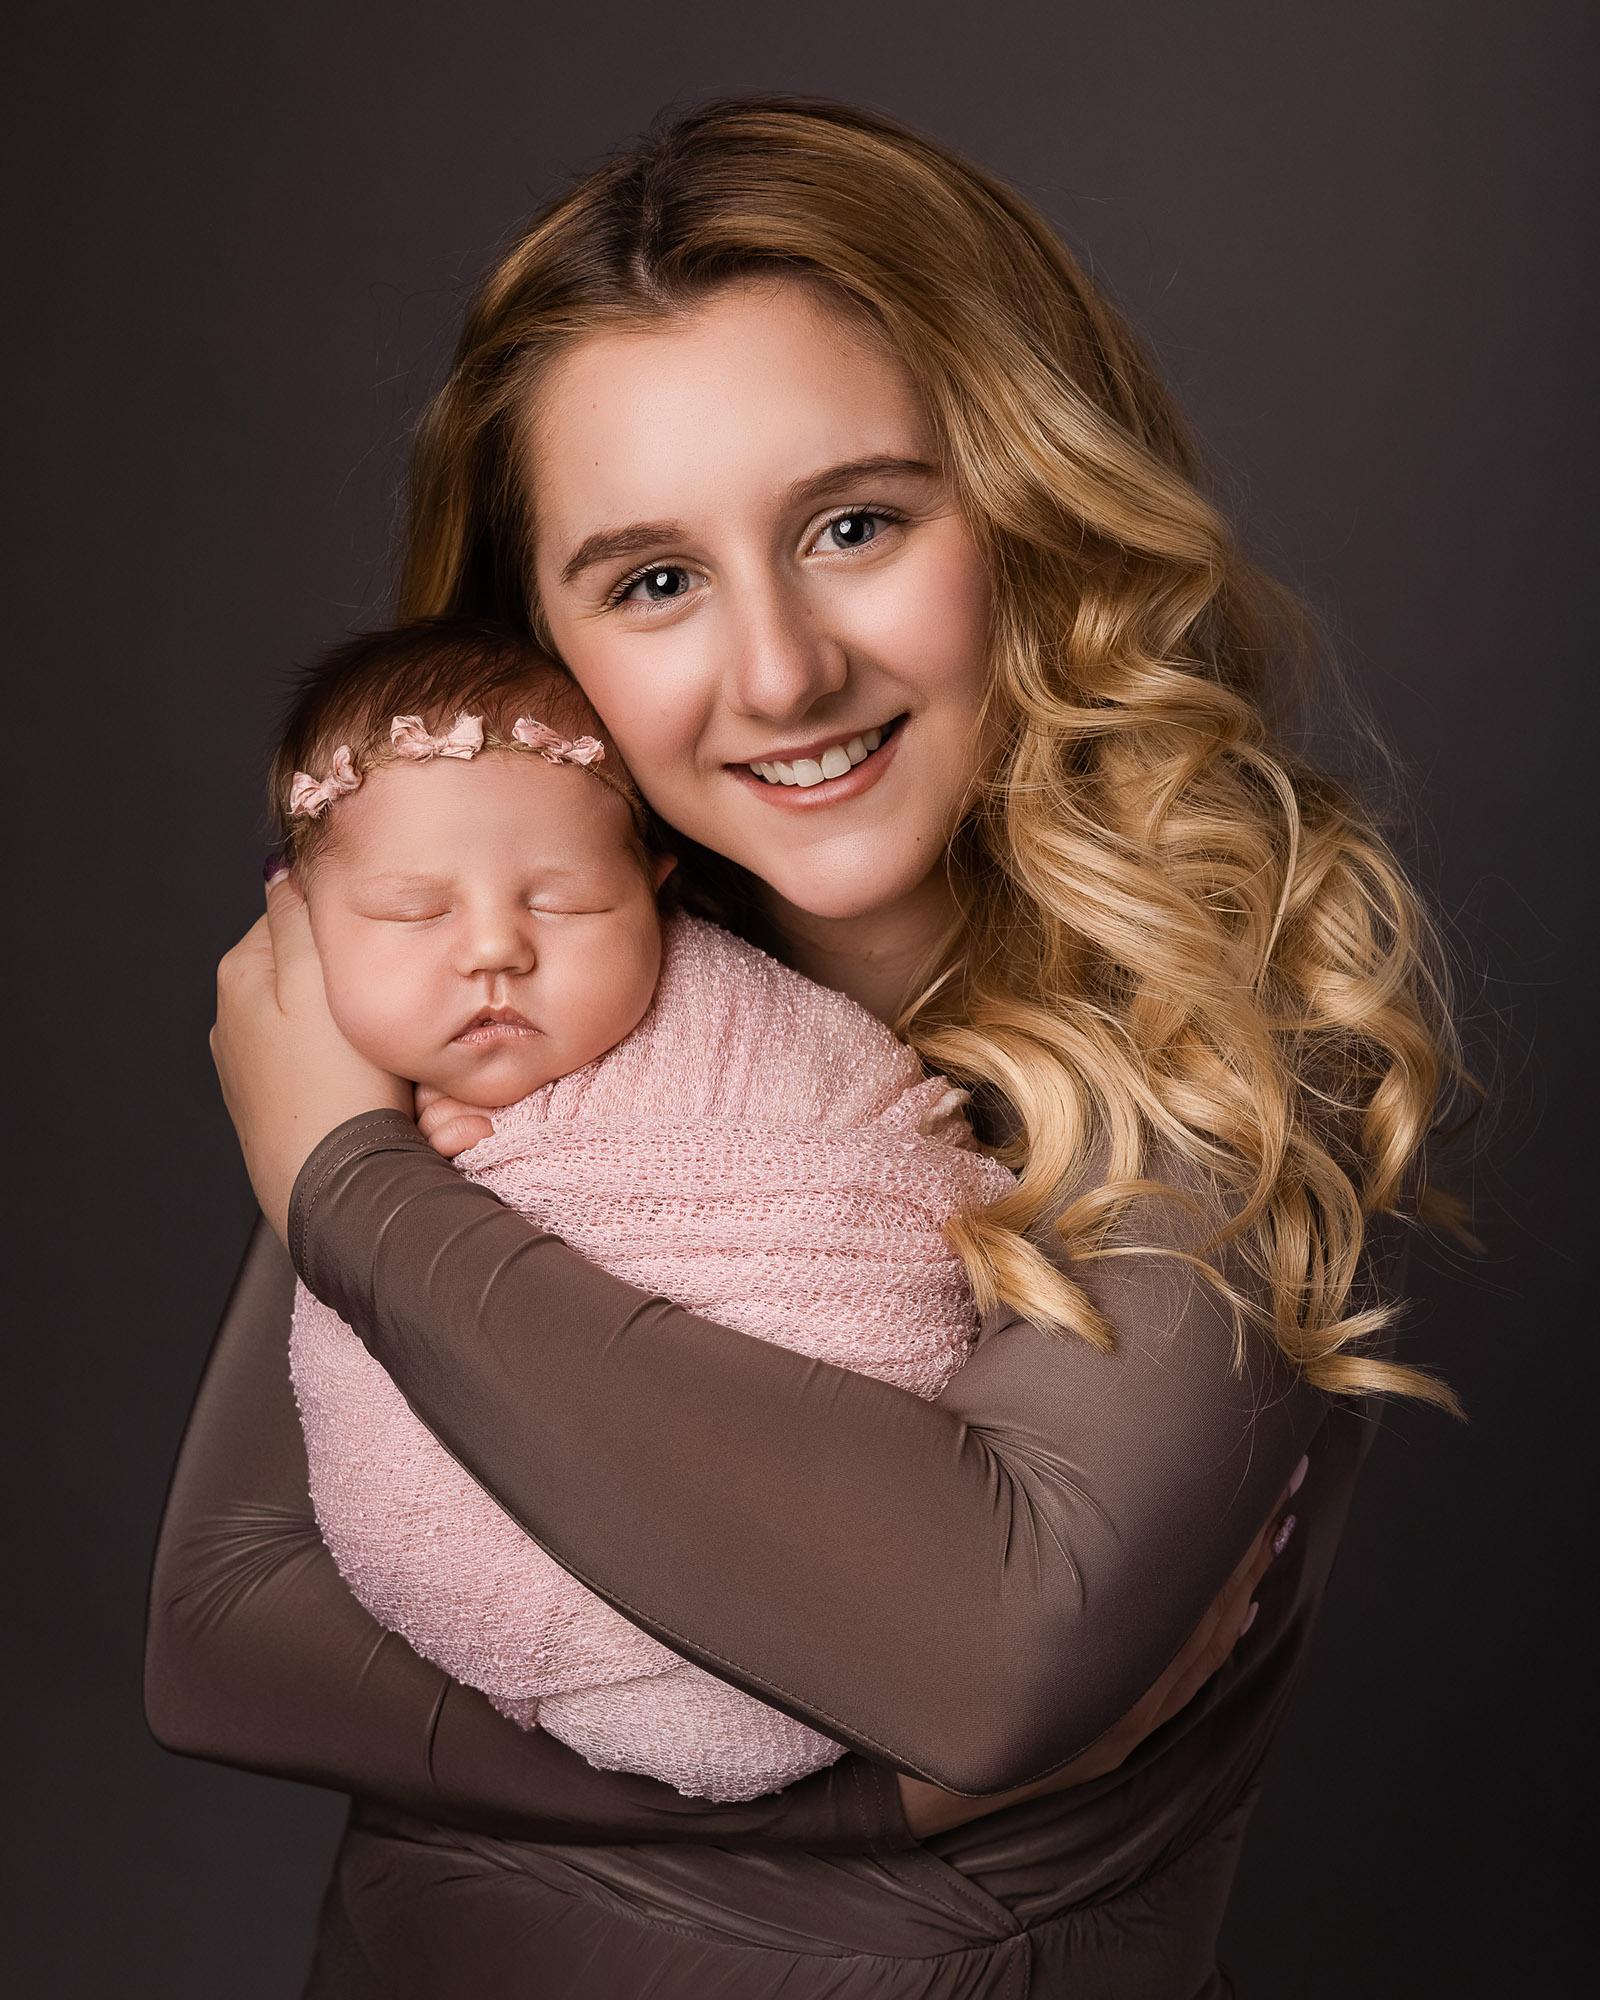 Newborn Baby Photography Yorkshire   Skipton   Keighley   Ilkley   Bradford   Leeds